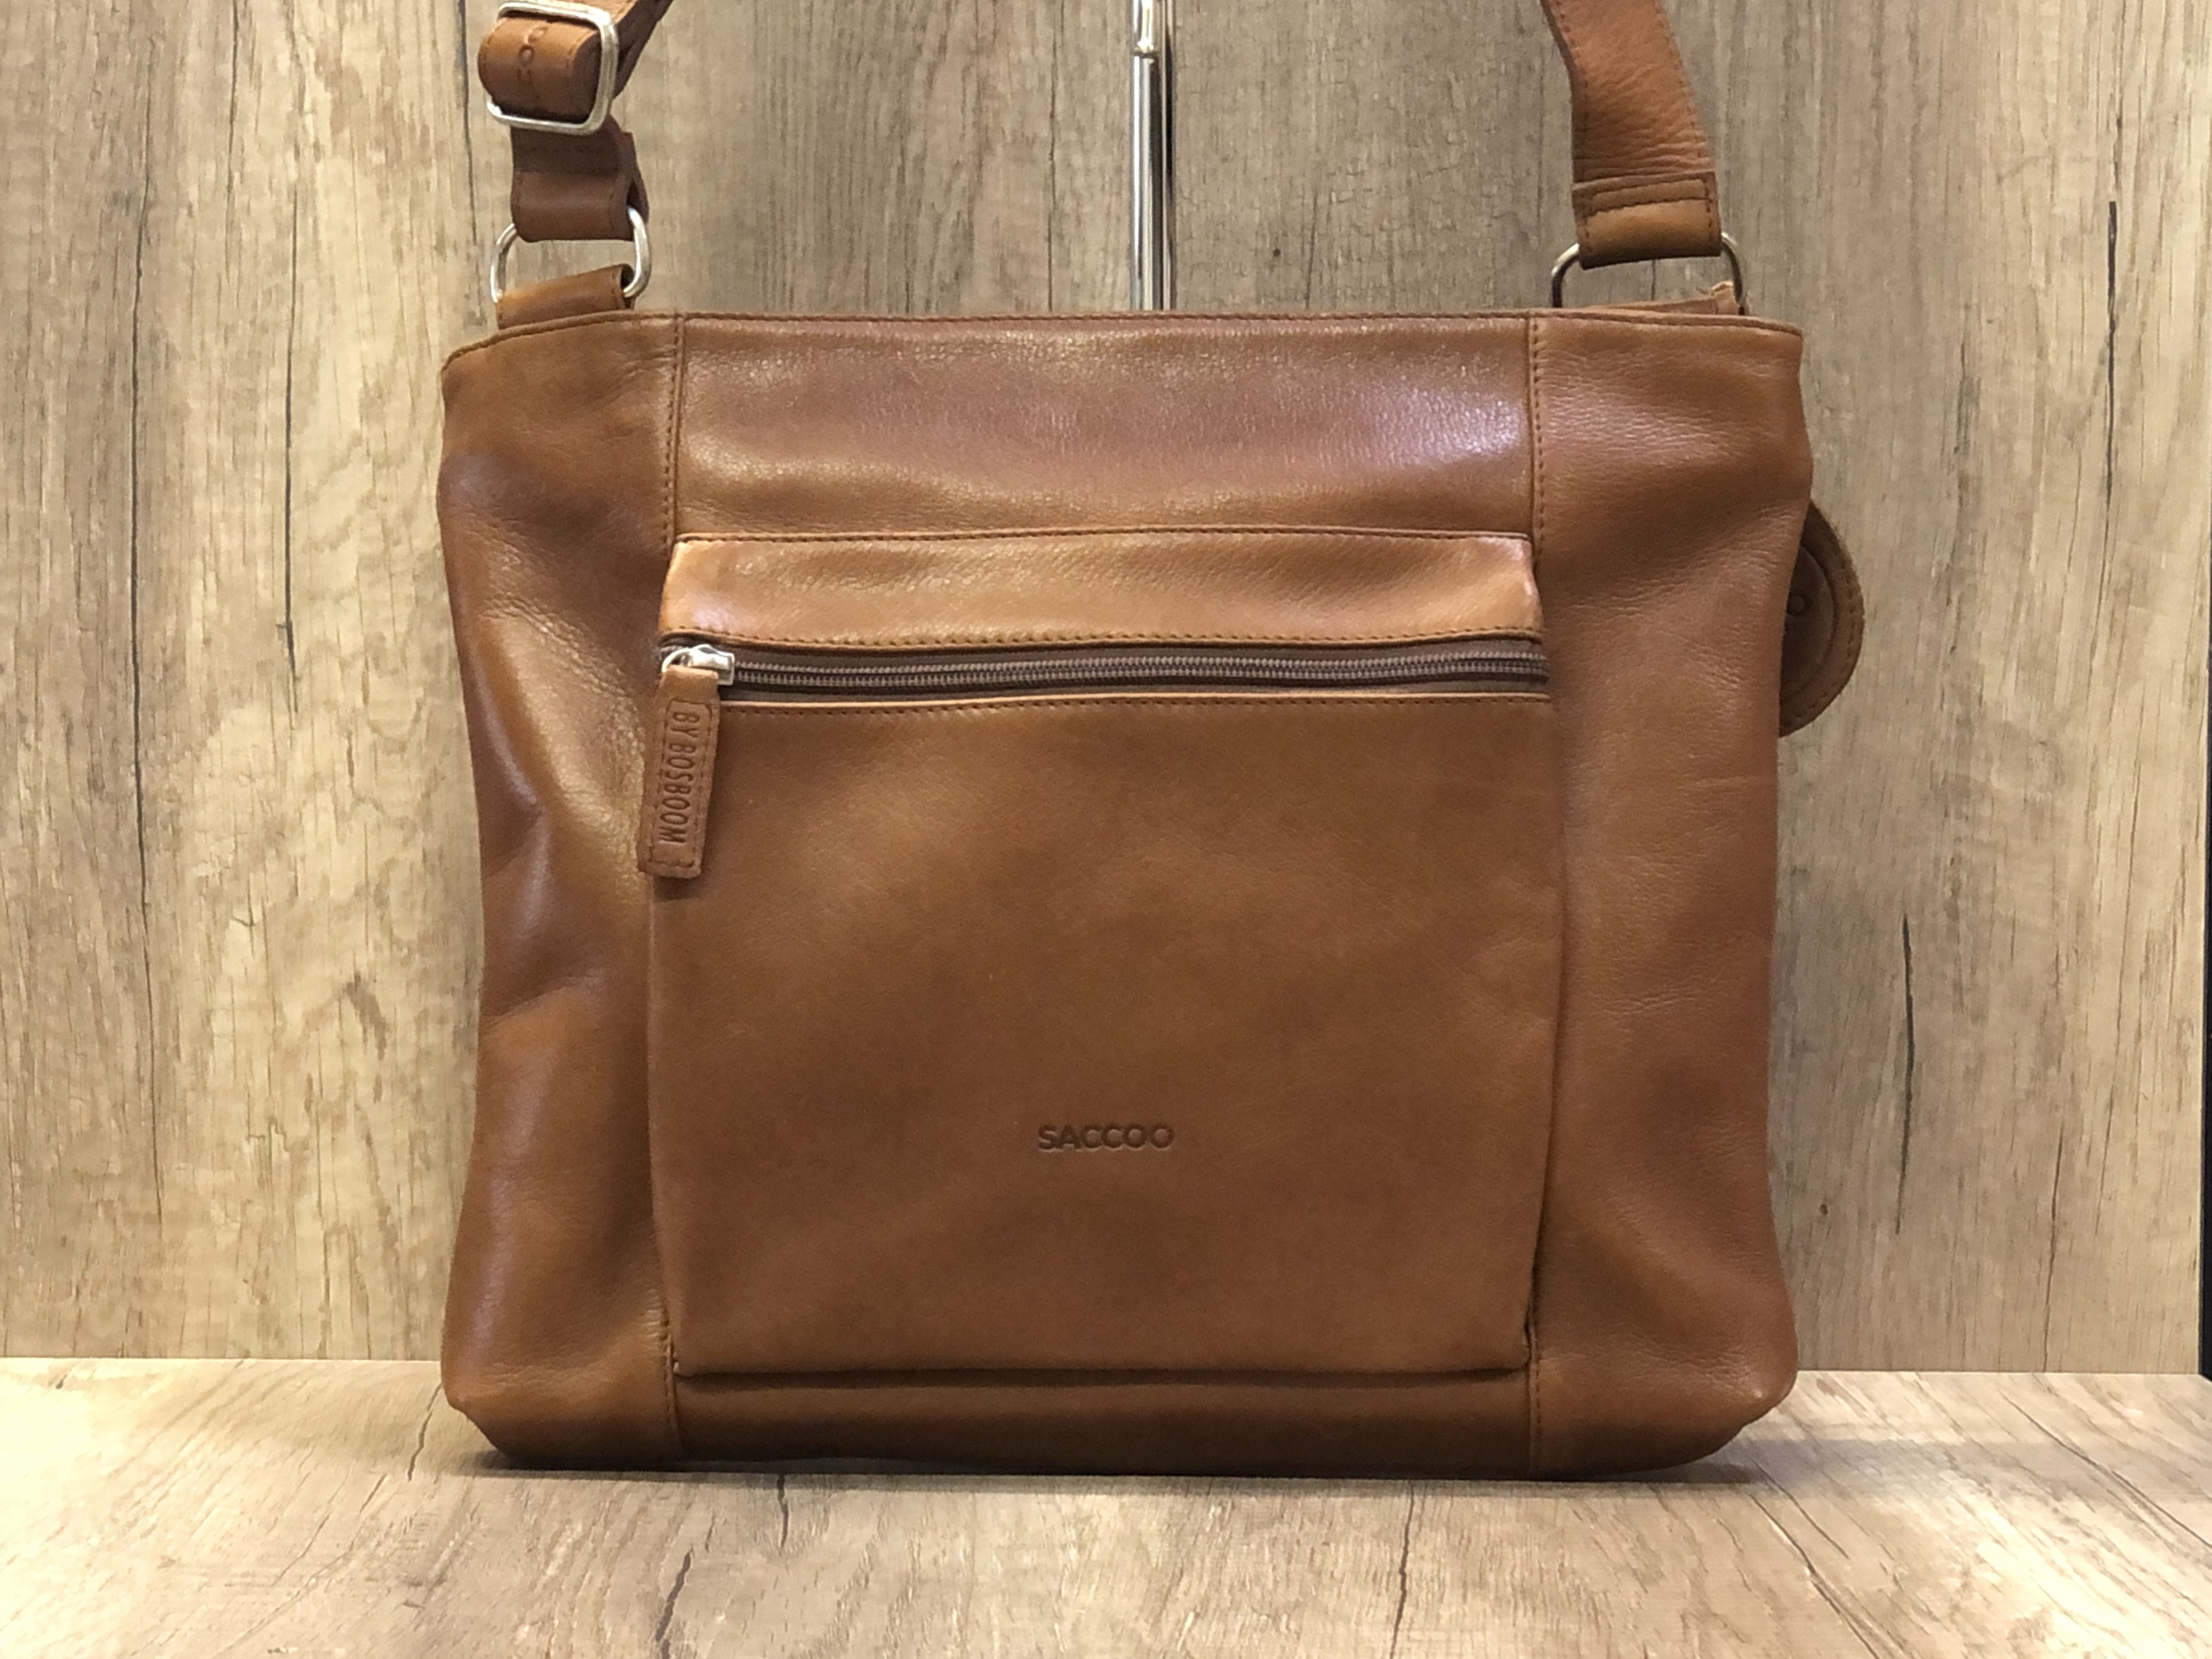 Saccoo-handtassen 12